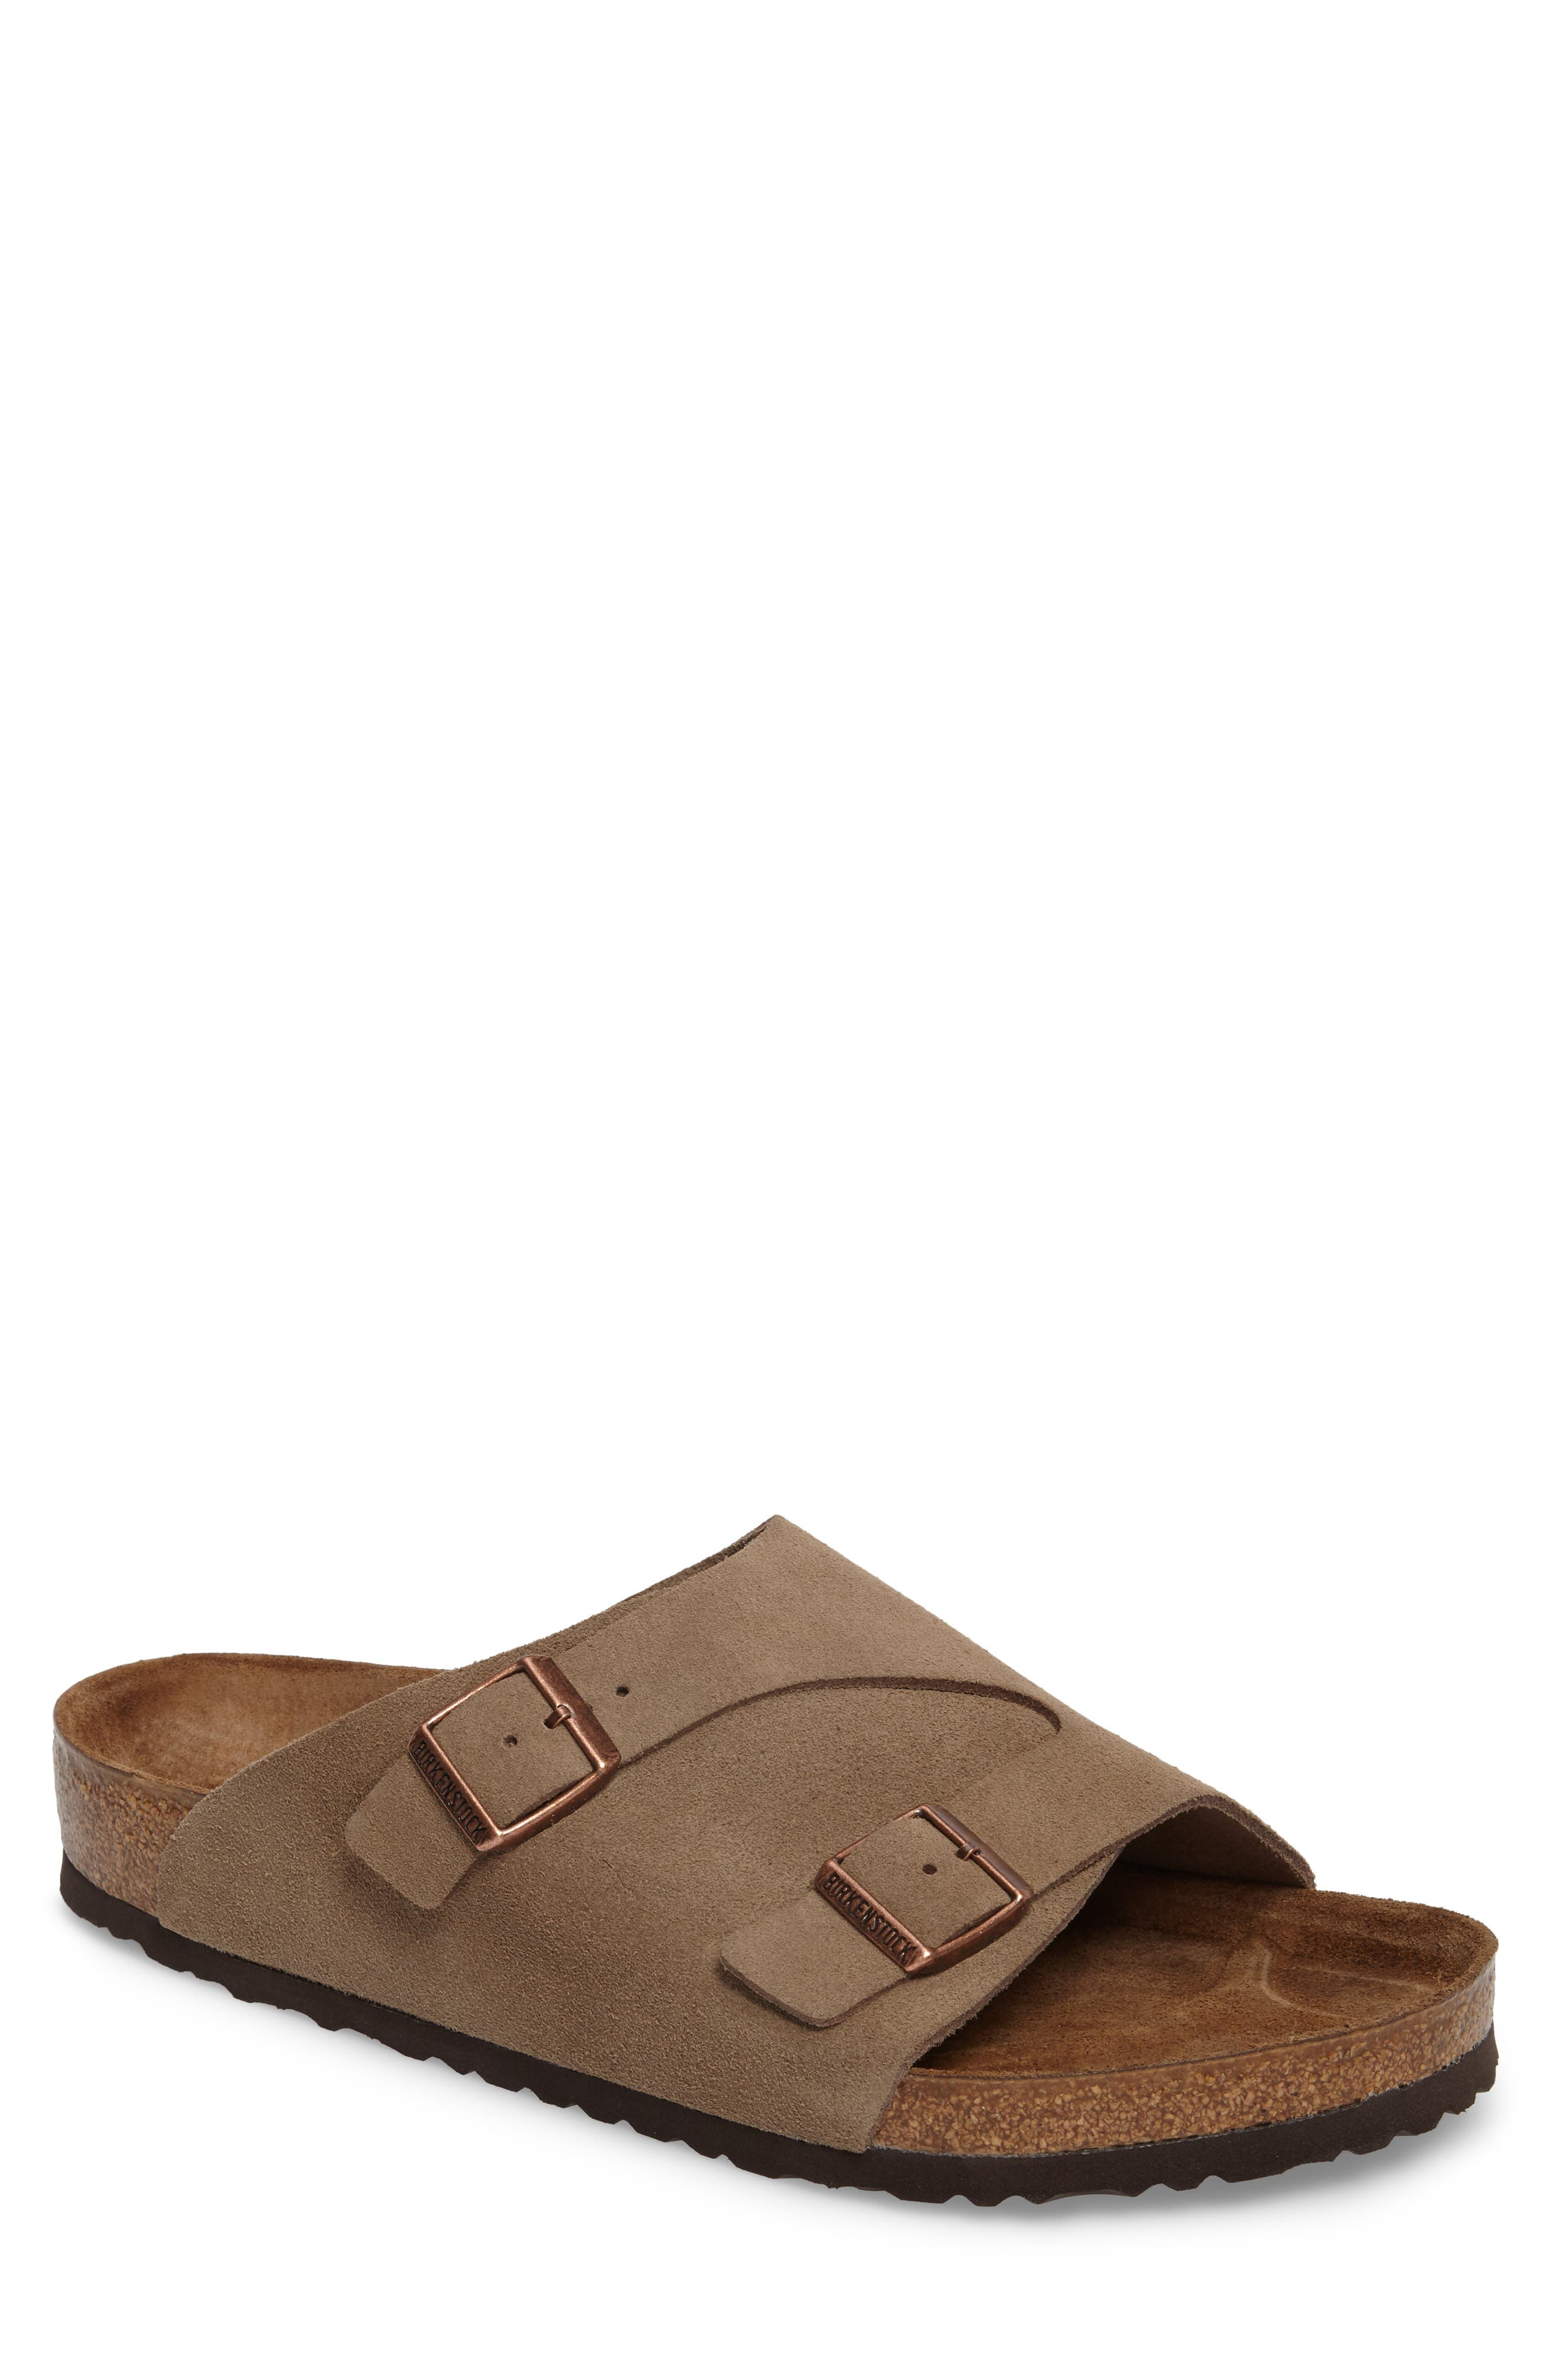 Birkenstock Zurich Slide Sandal (Men)